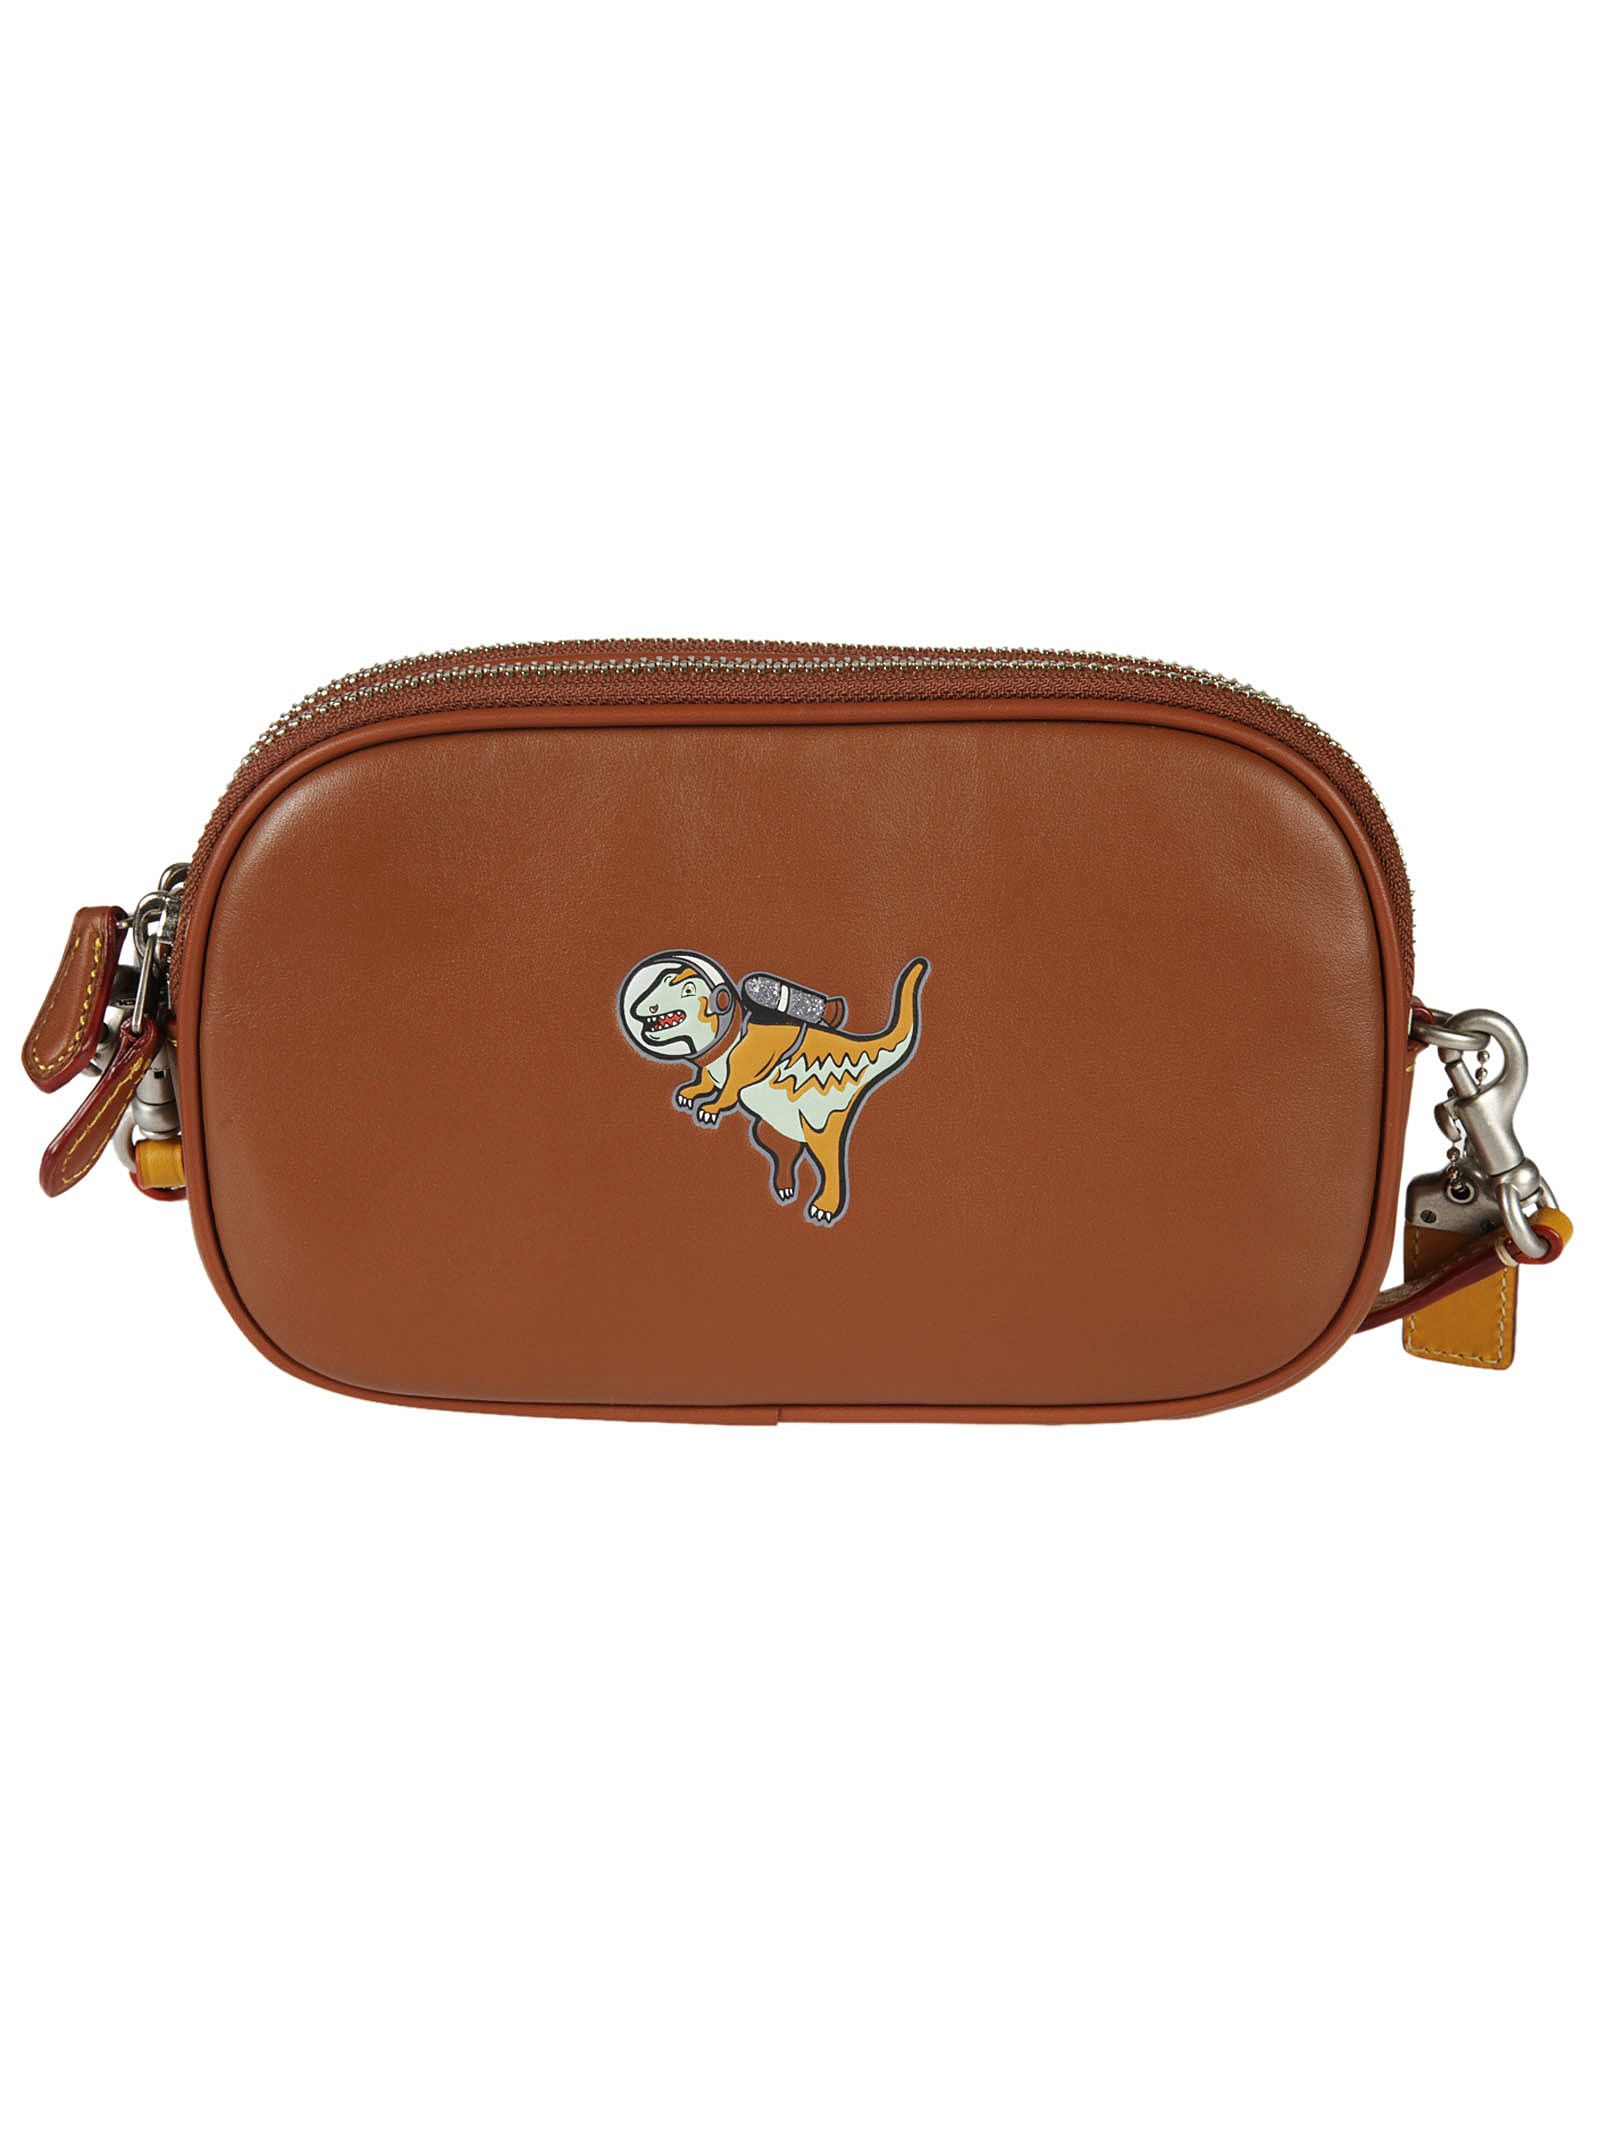 Coach Coach Dinosaur Shoulder Bag